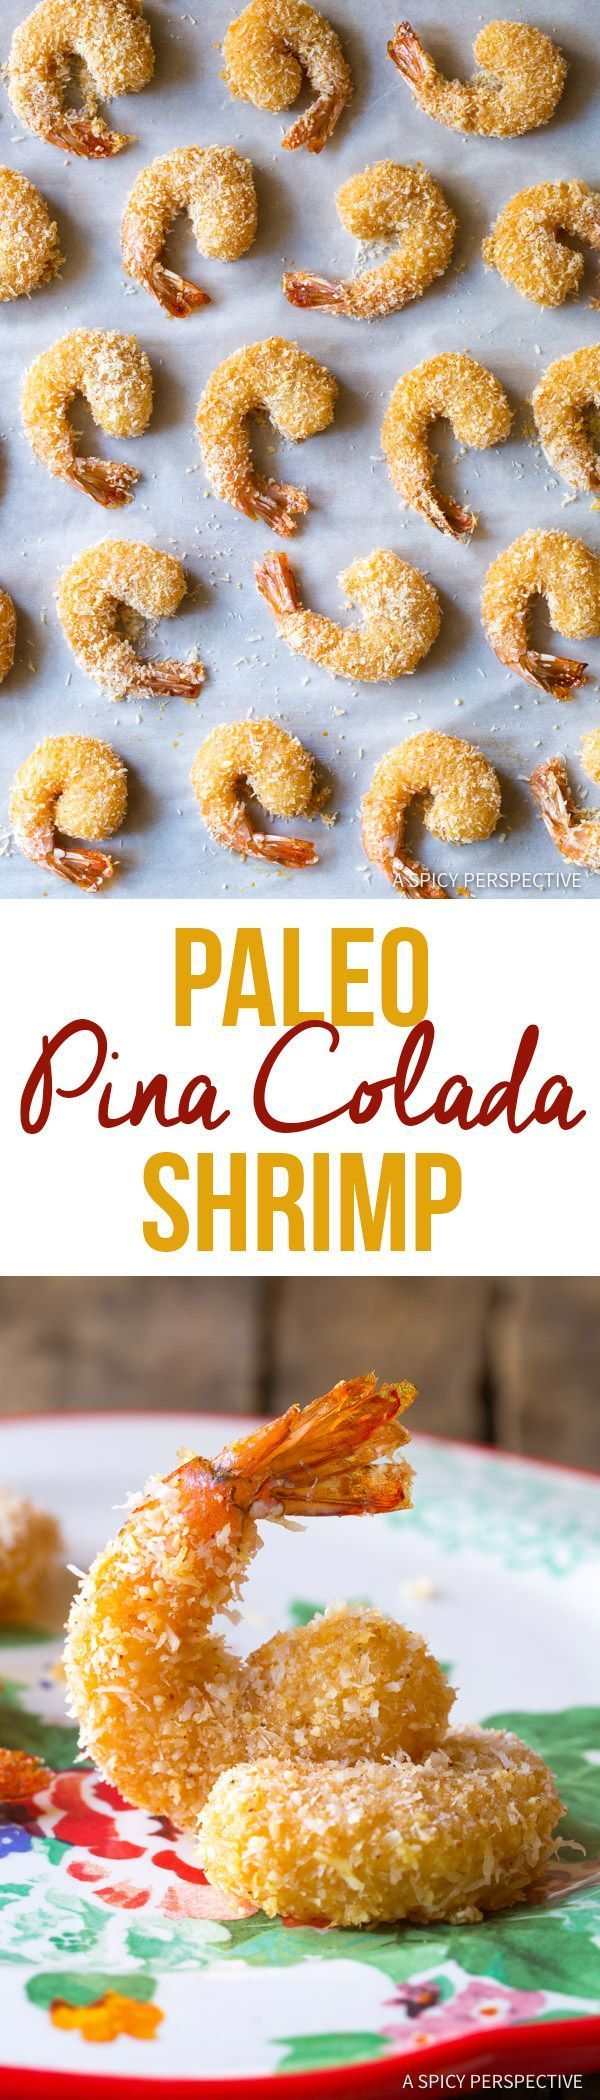 Healthy Paleo Coconut Shrimp Recipe (Pina Colada Shrimp & Gluten Free!) | ASpicyPerspective...